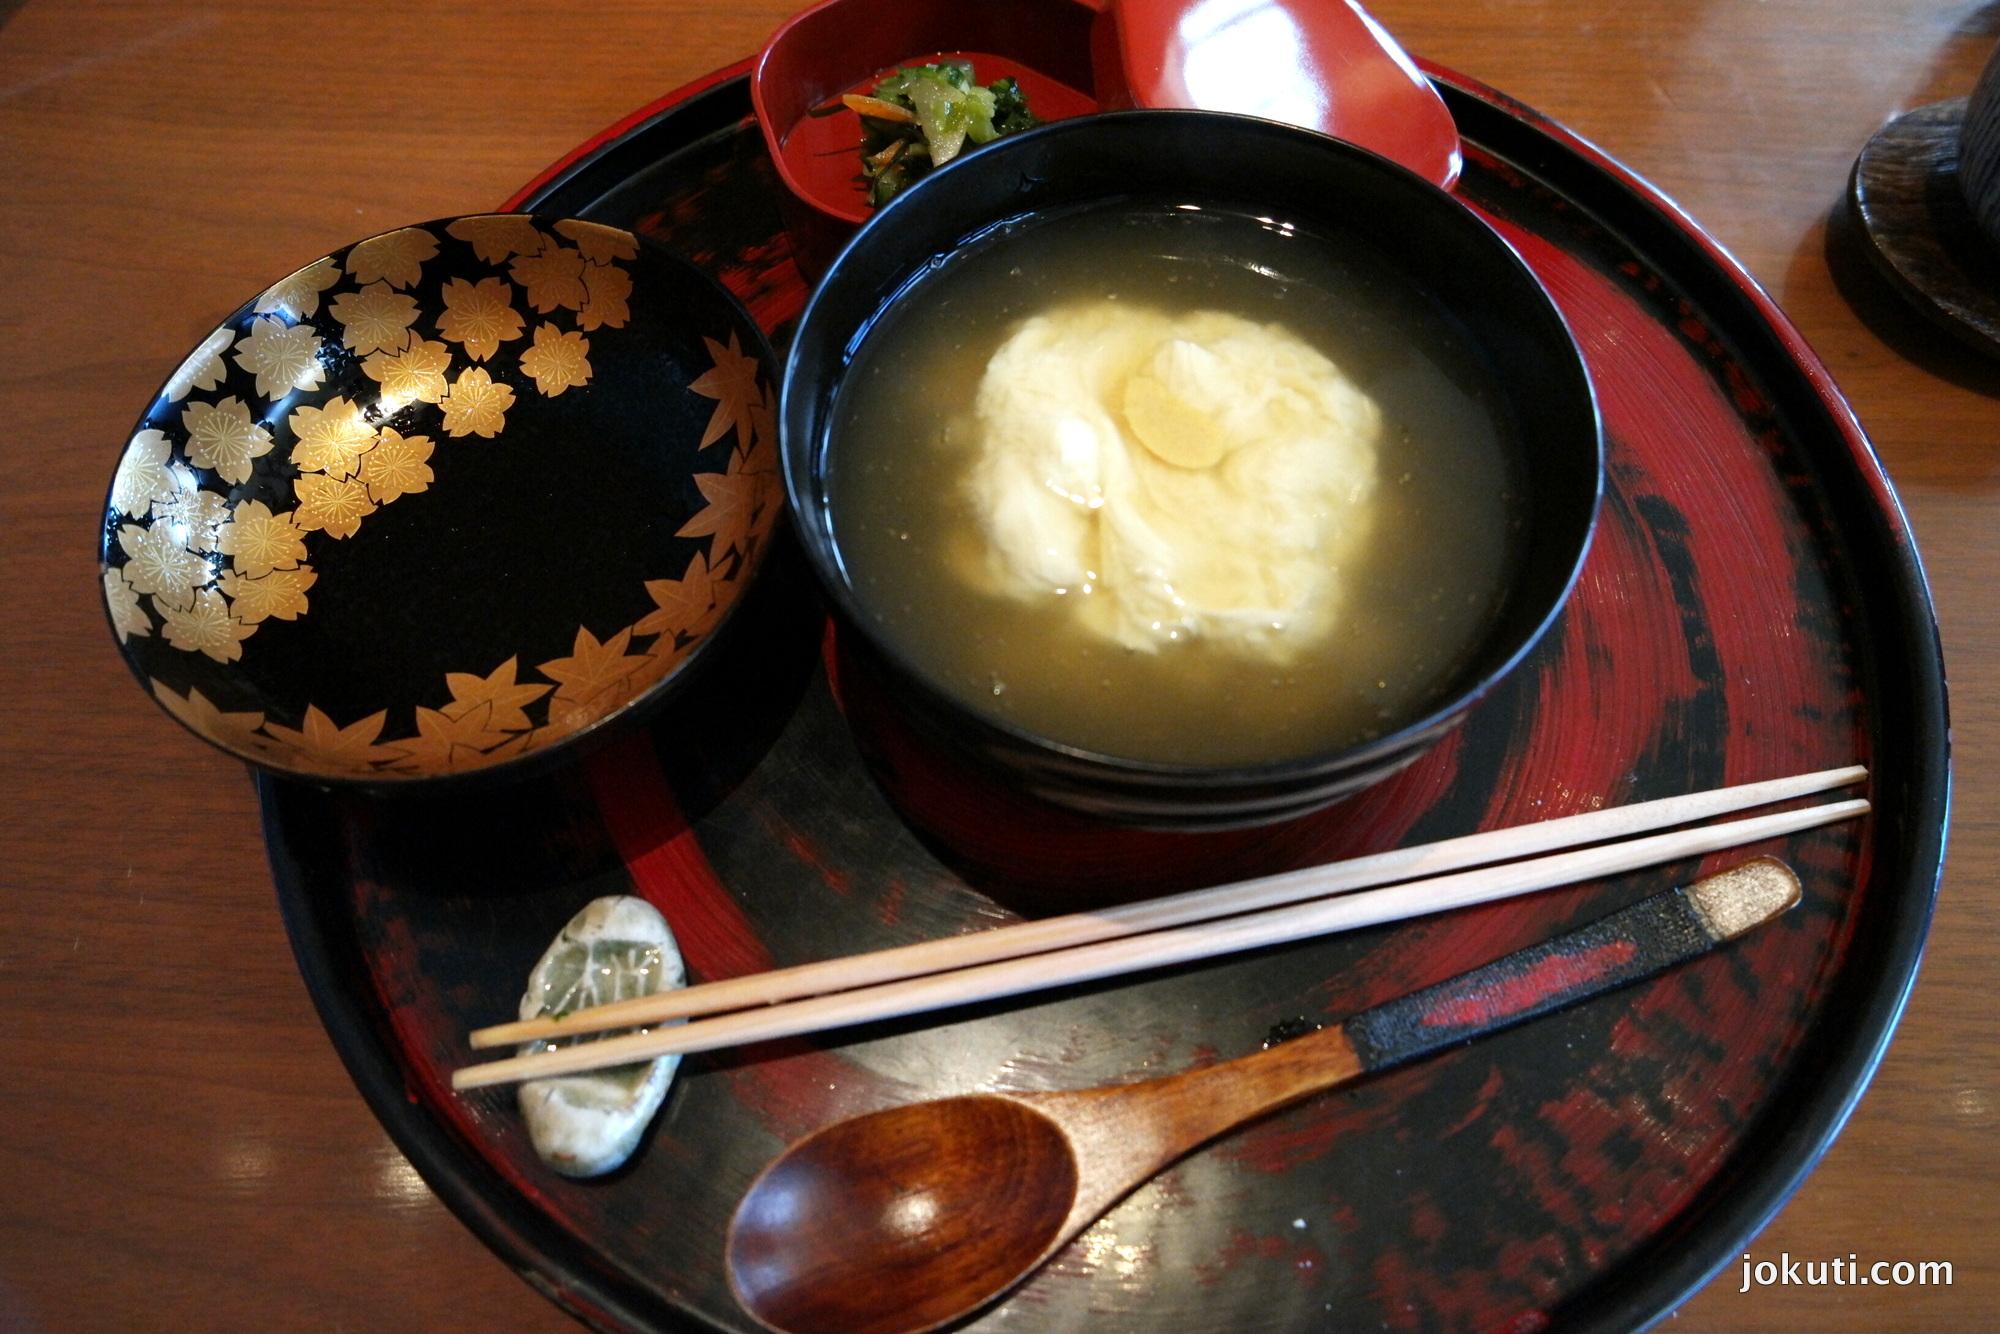 Steamed rice, tofu skin, hot broth, Japanese pickles